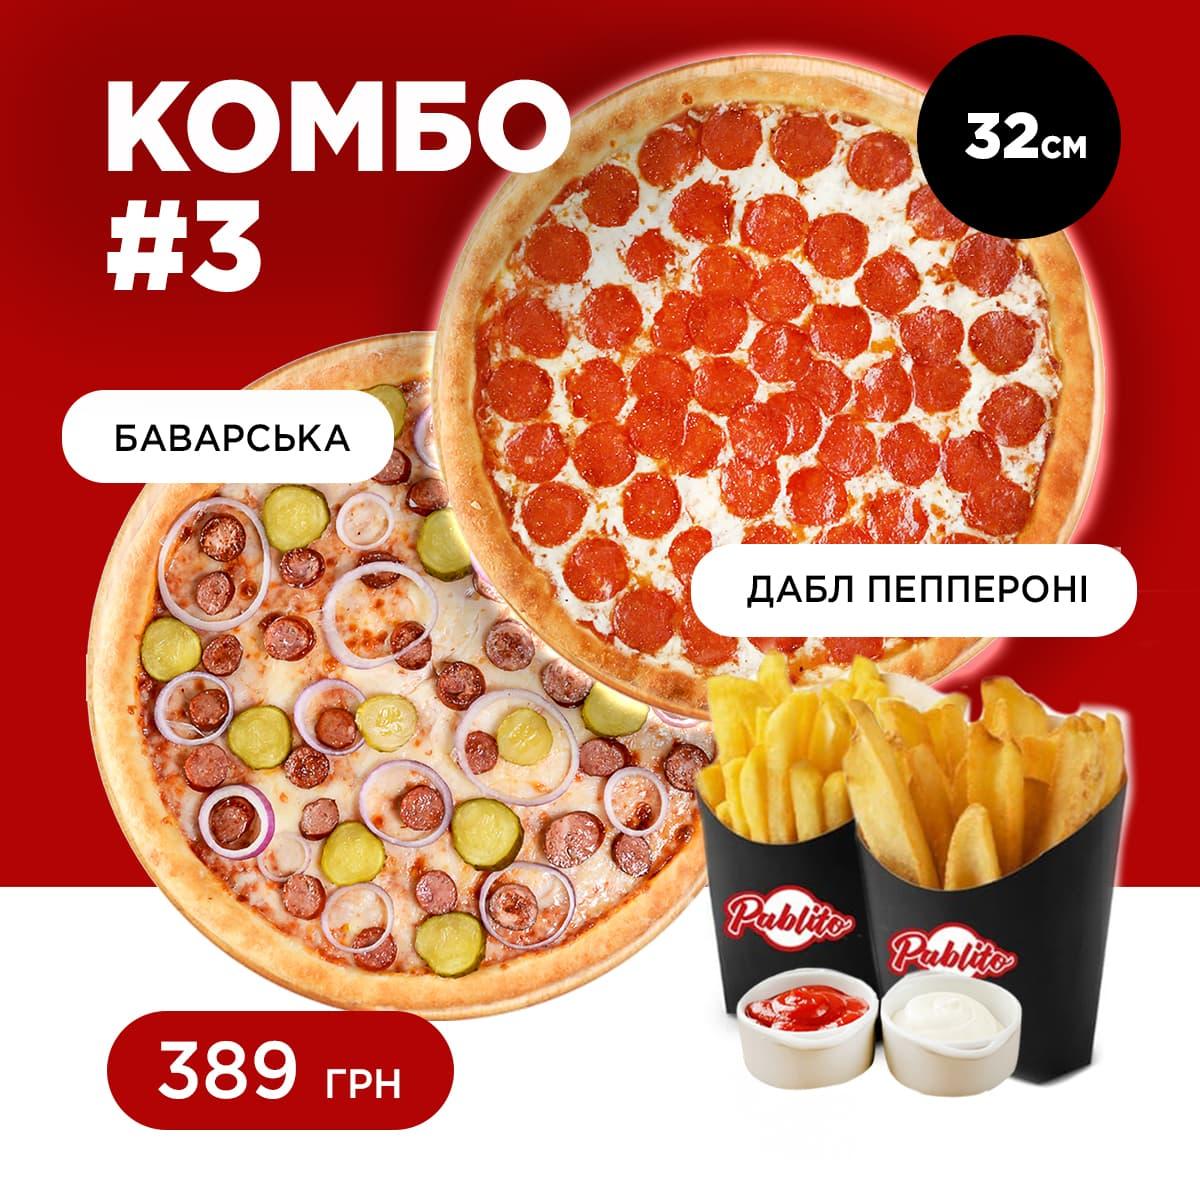 Комбо-меню №3 - фото